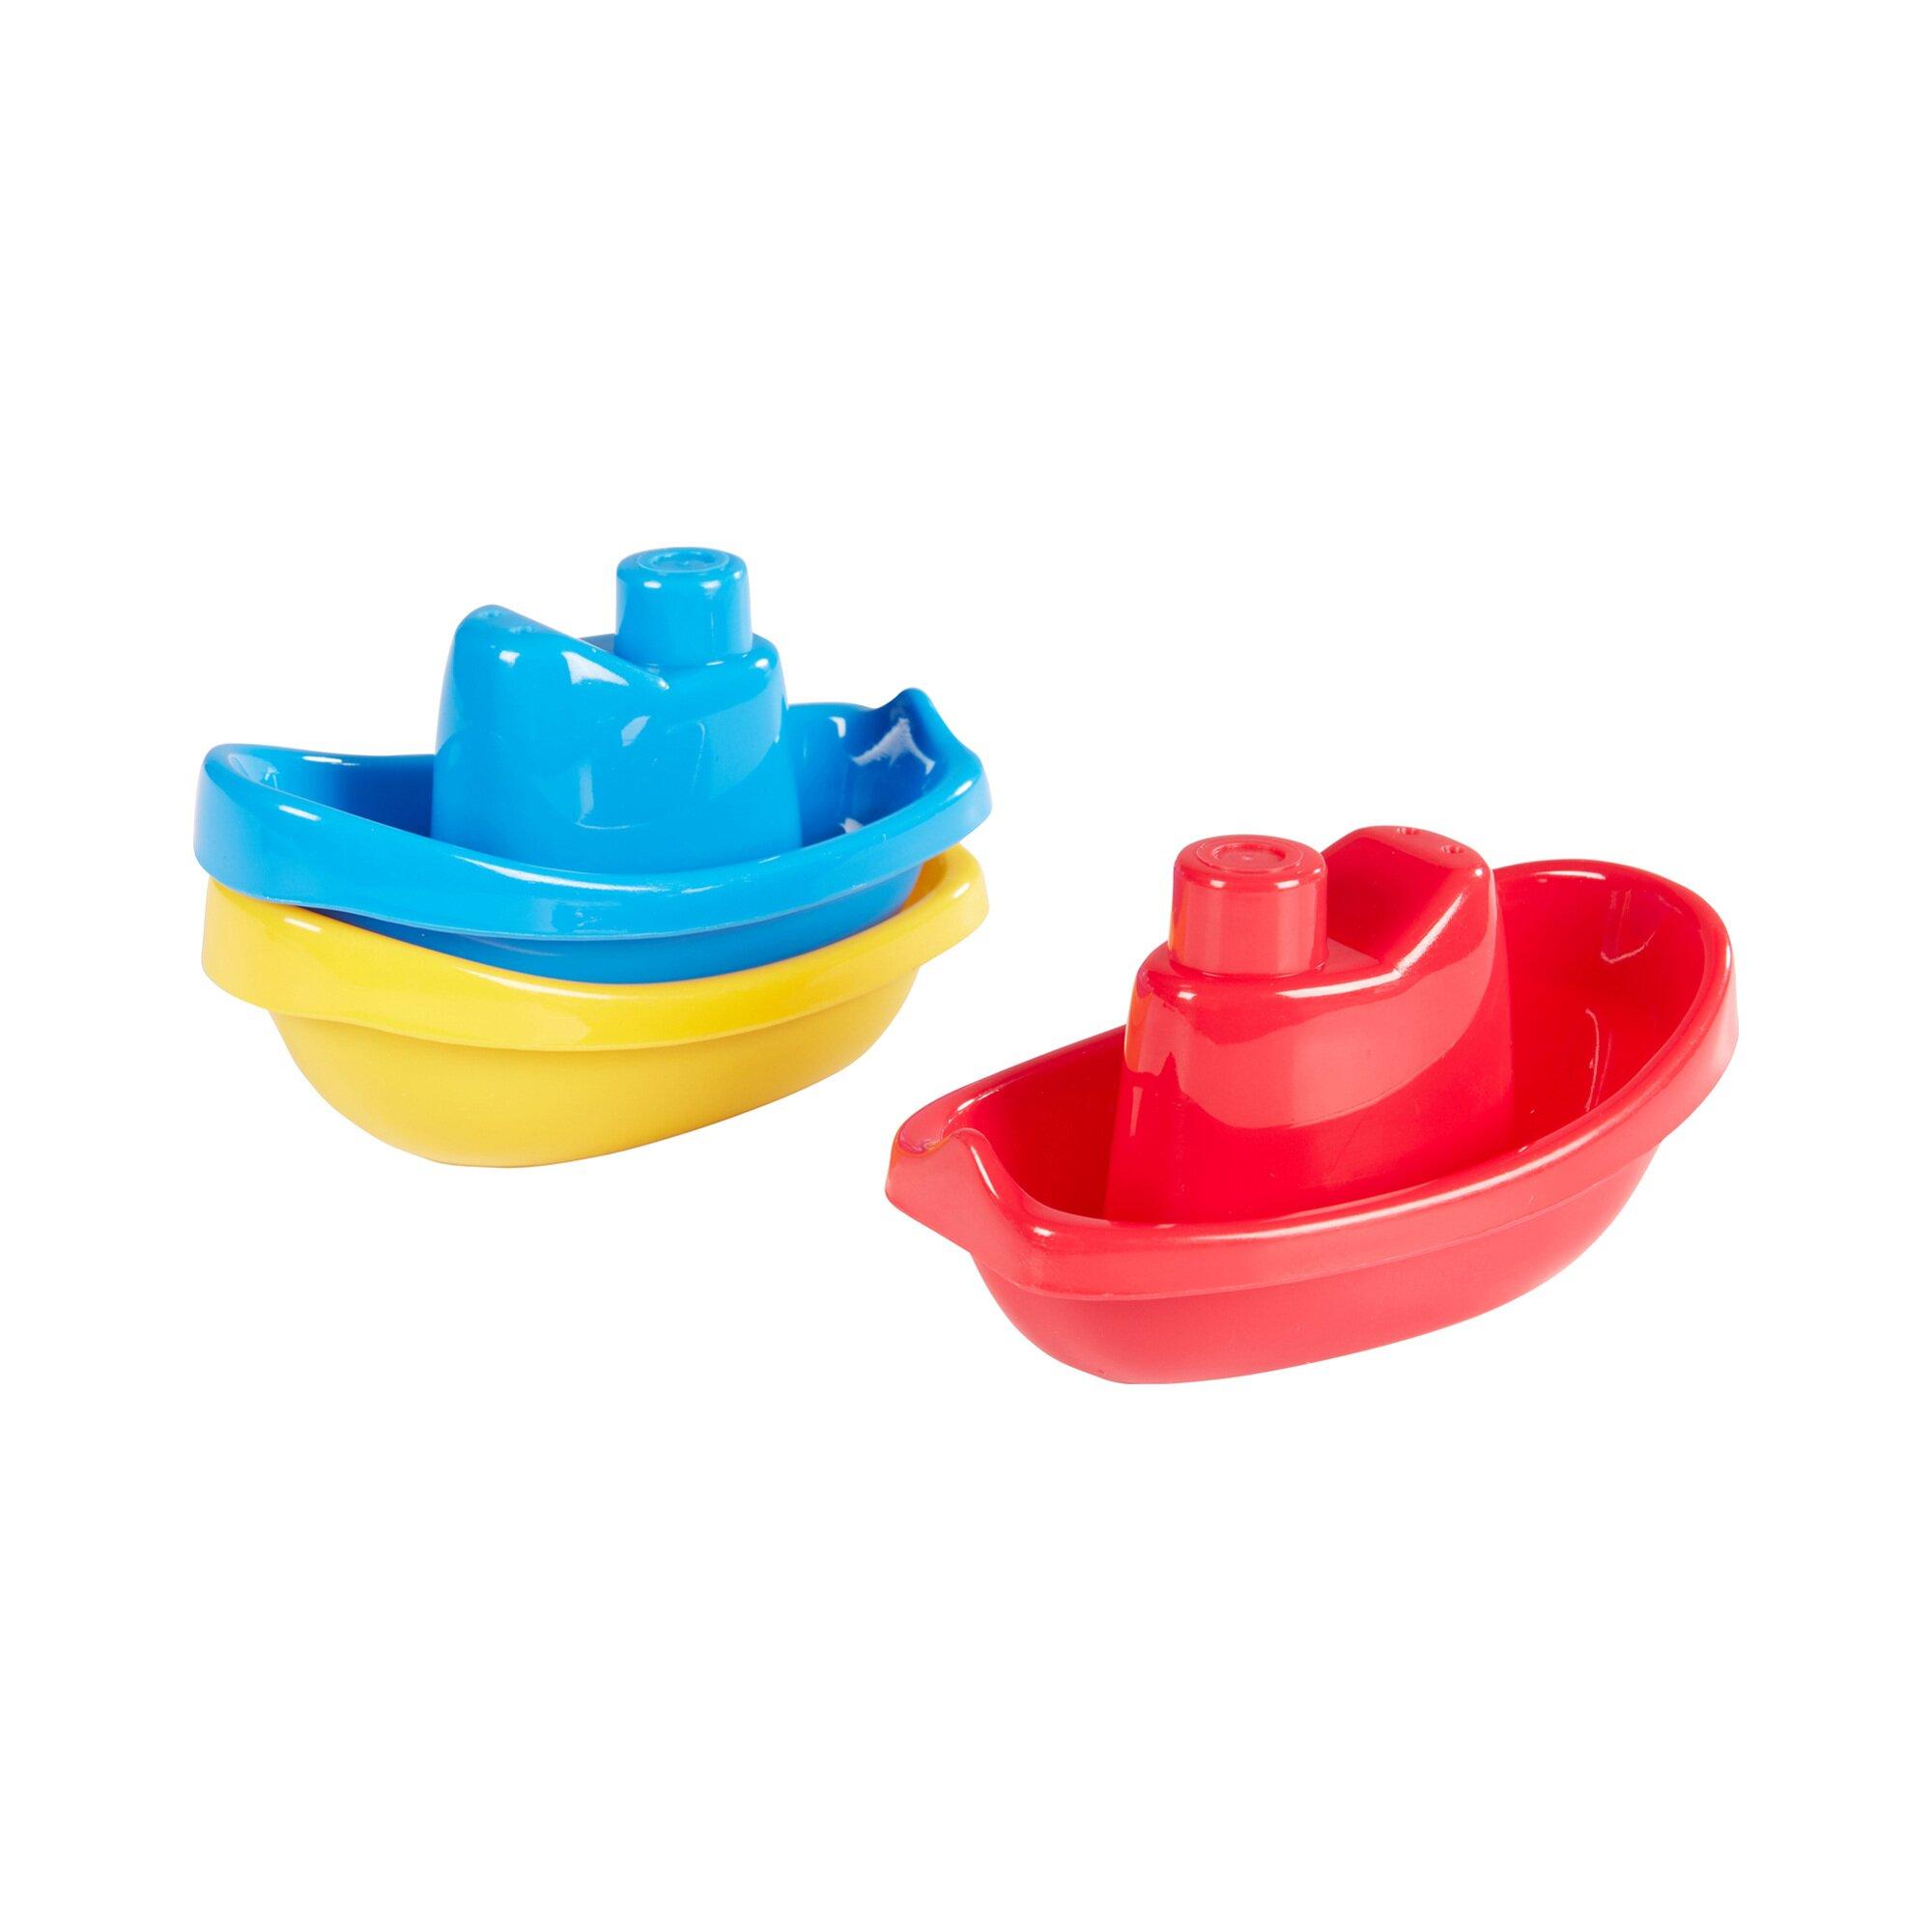 solini-badespielzeug-3-badeboote